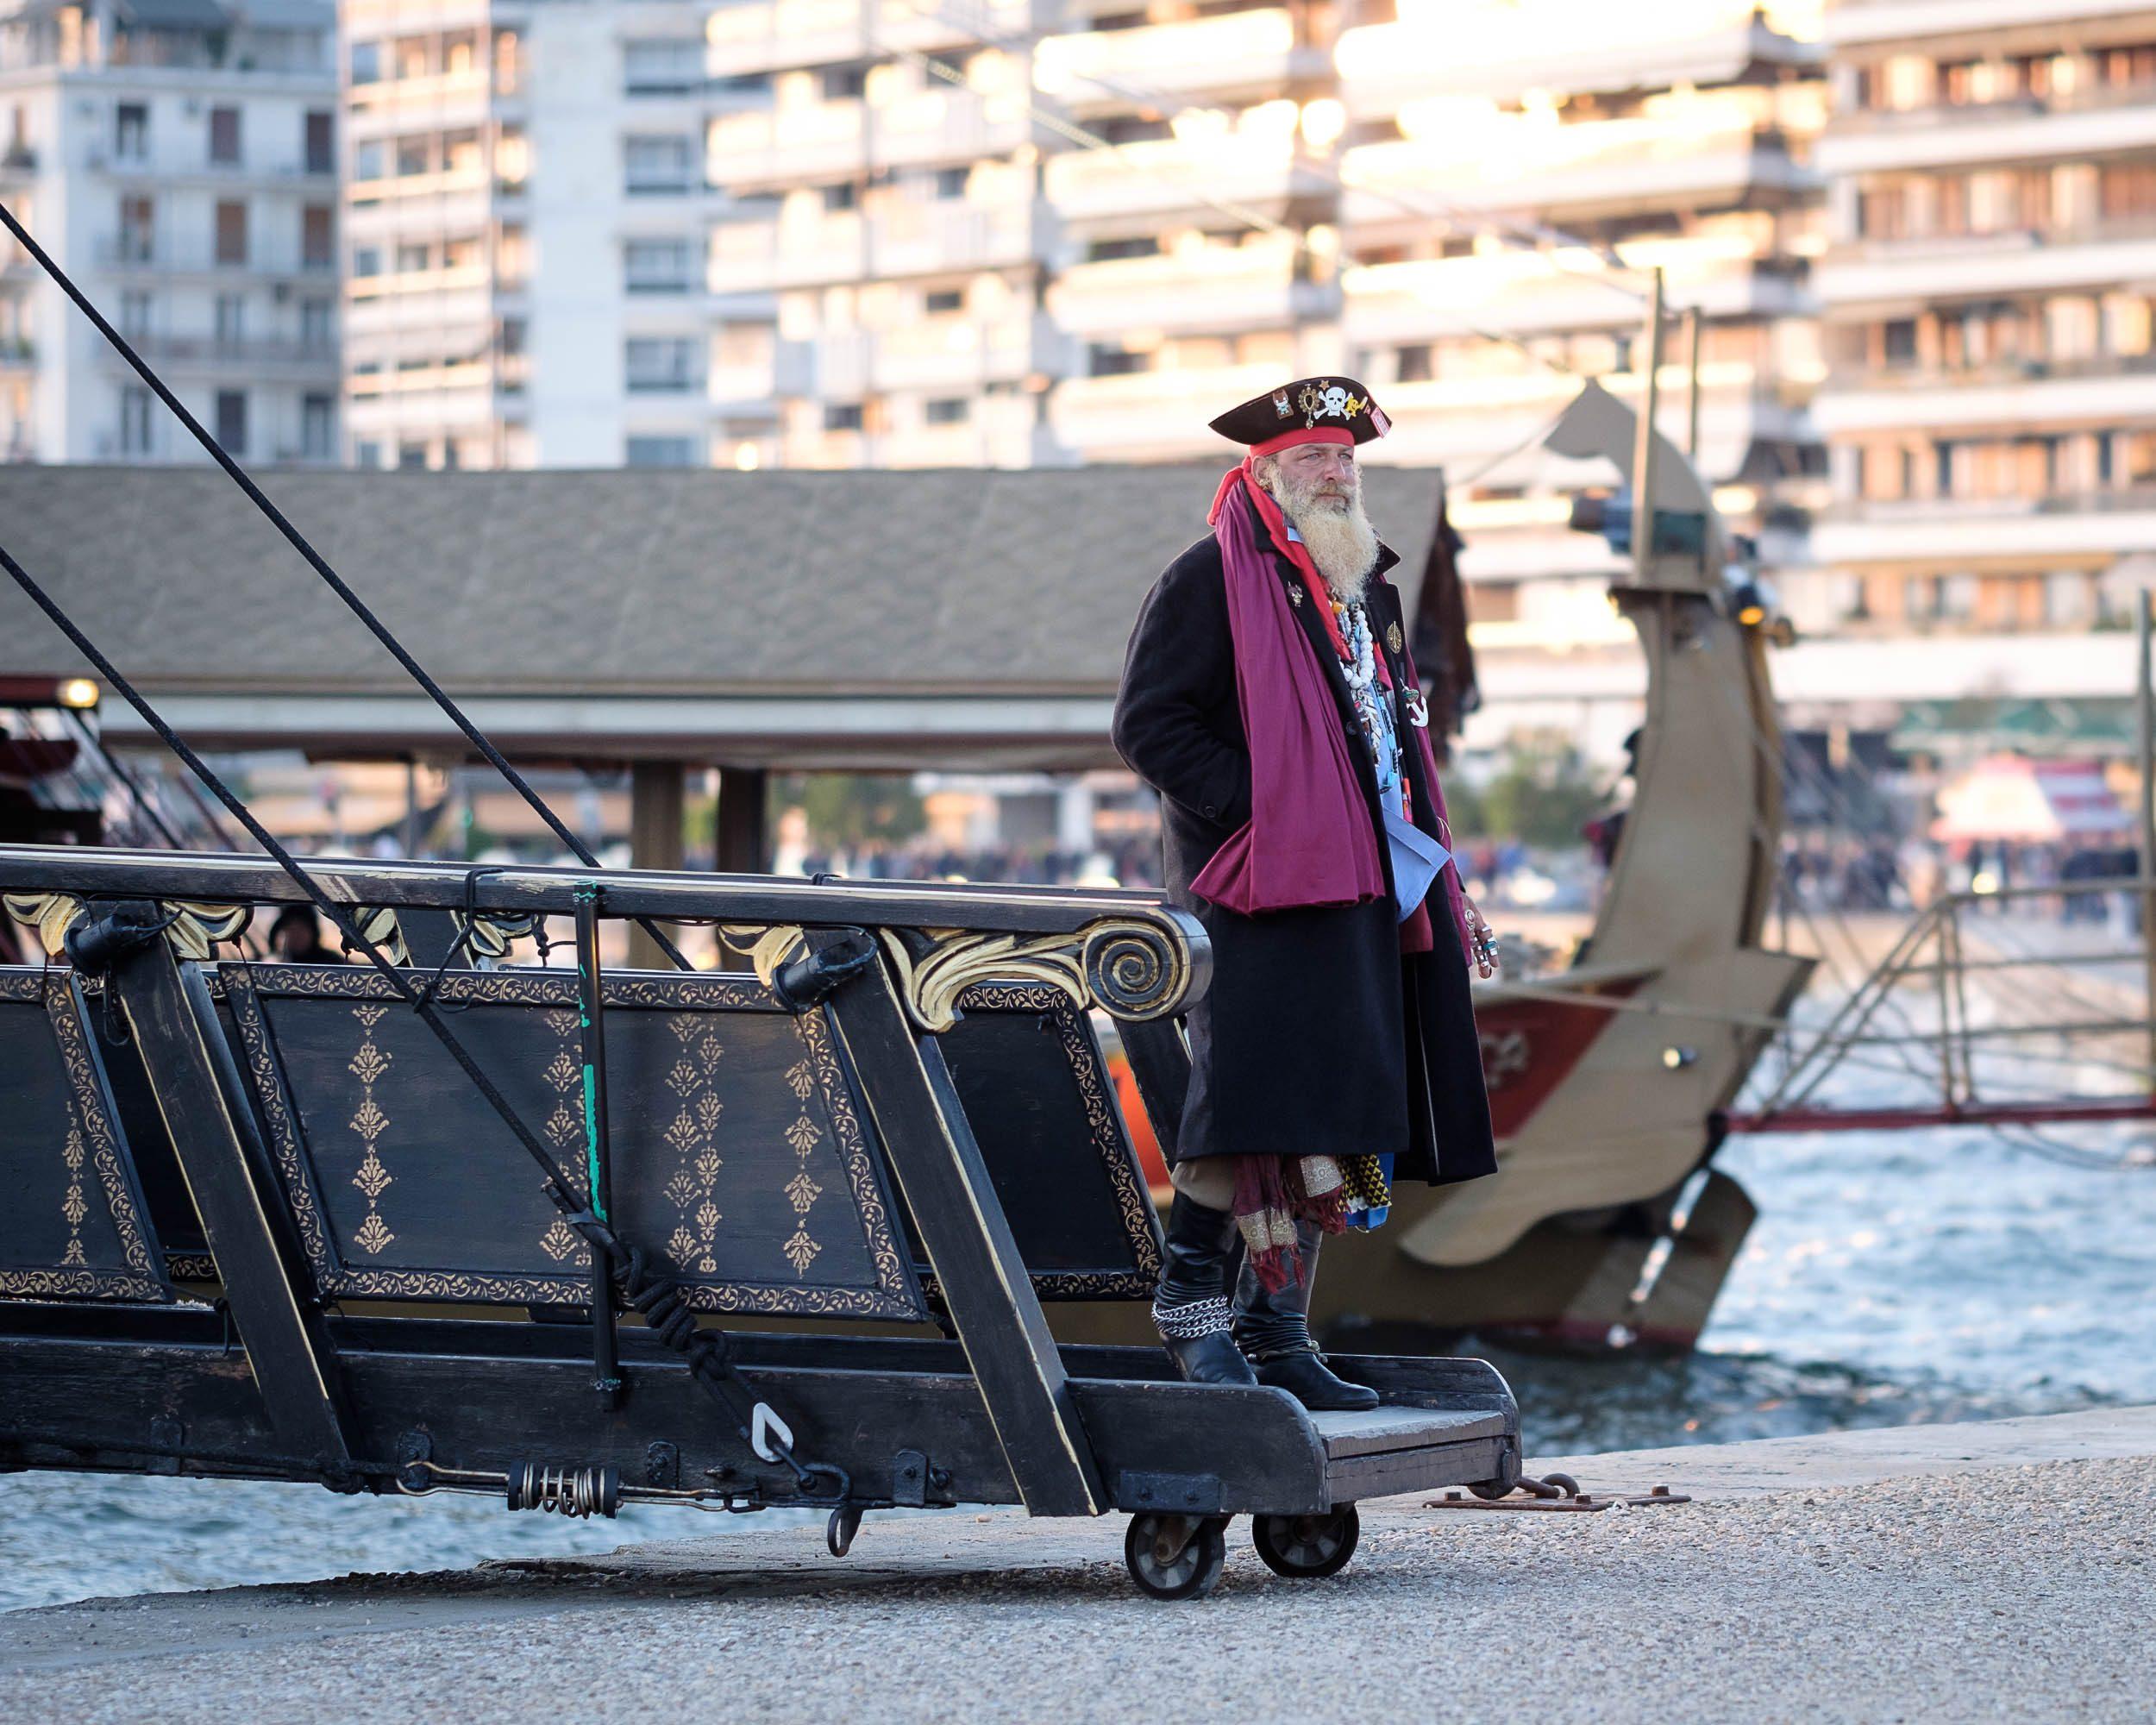 Promenade, Thessaloniki, Griechenland